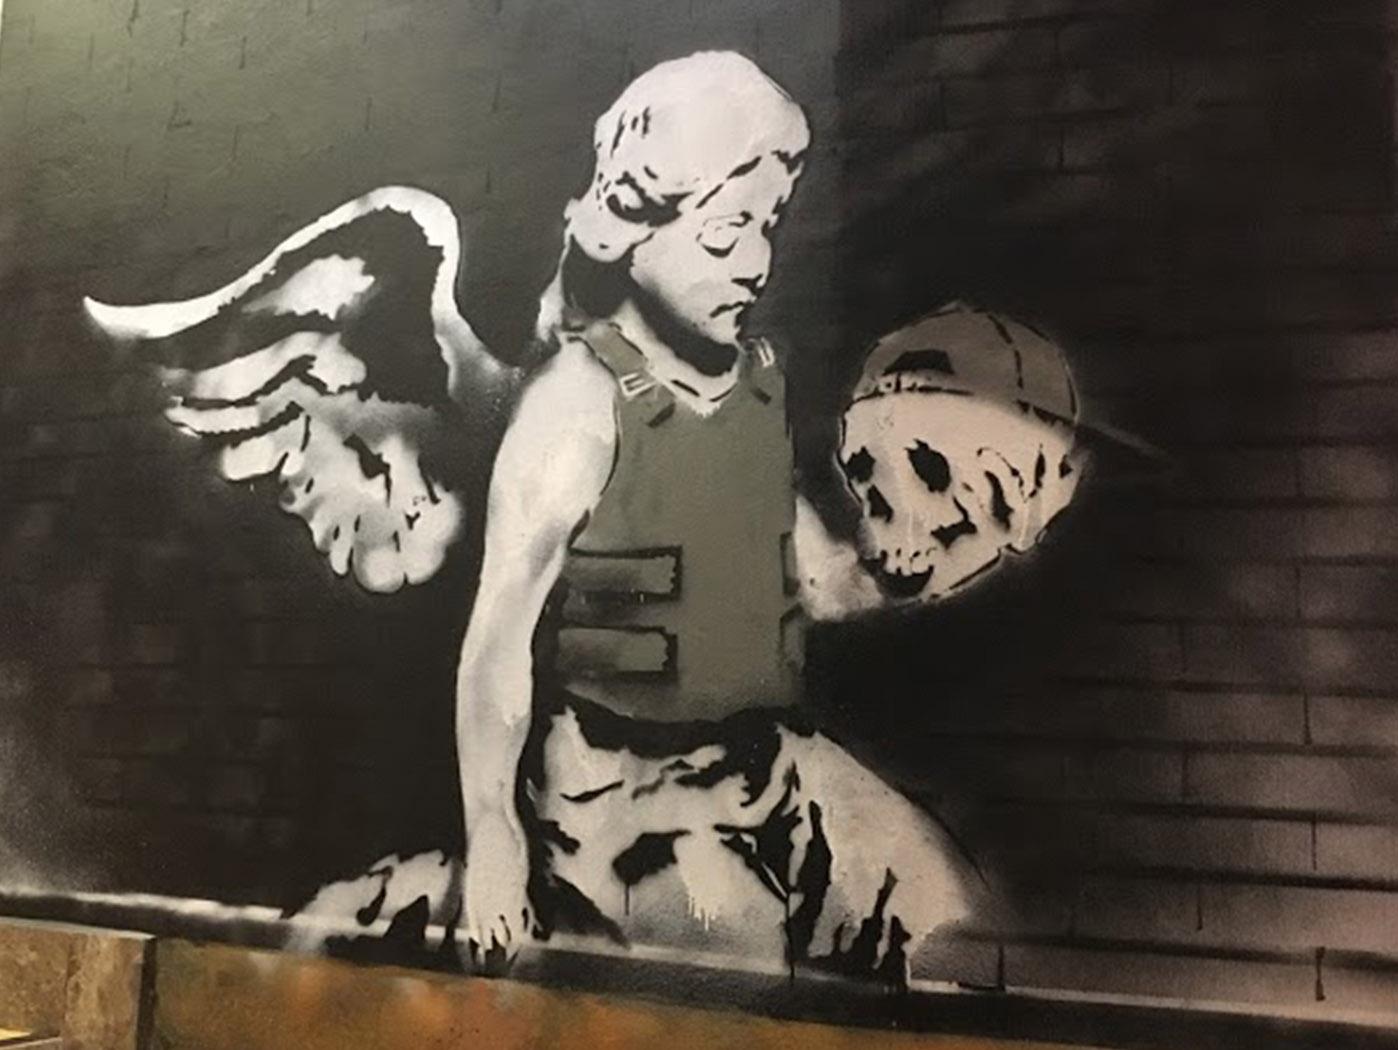 Bansky-angel-in-bulletproof-vest-Angel-con-chaleco-antibalas-street-art-magazinehorse